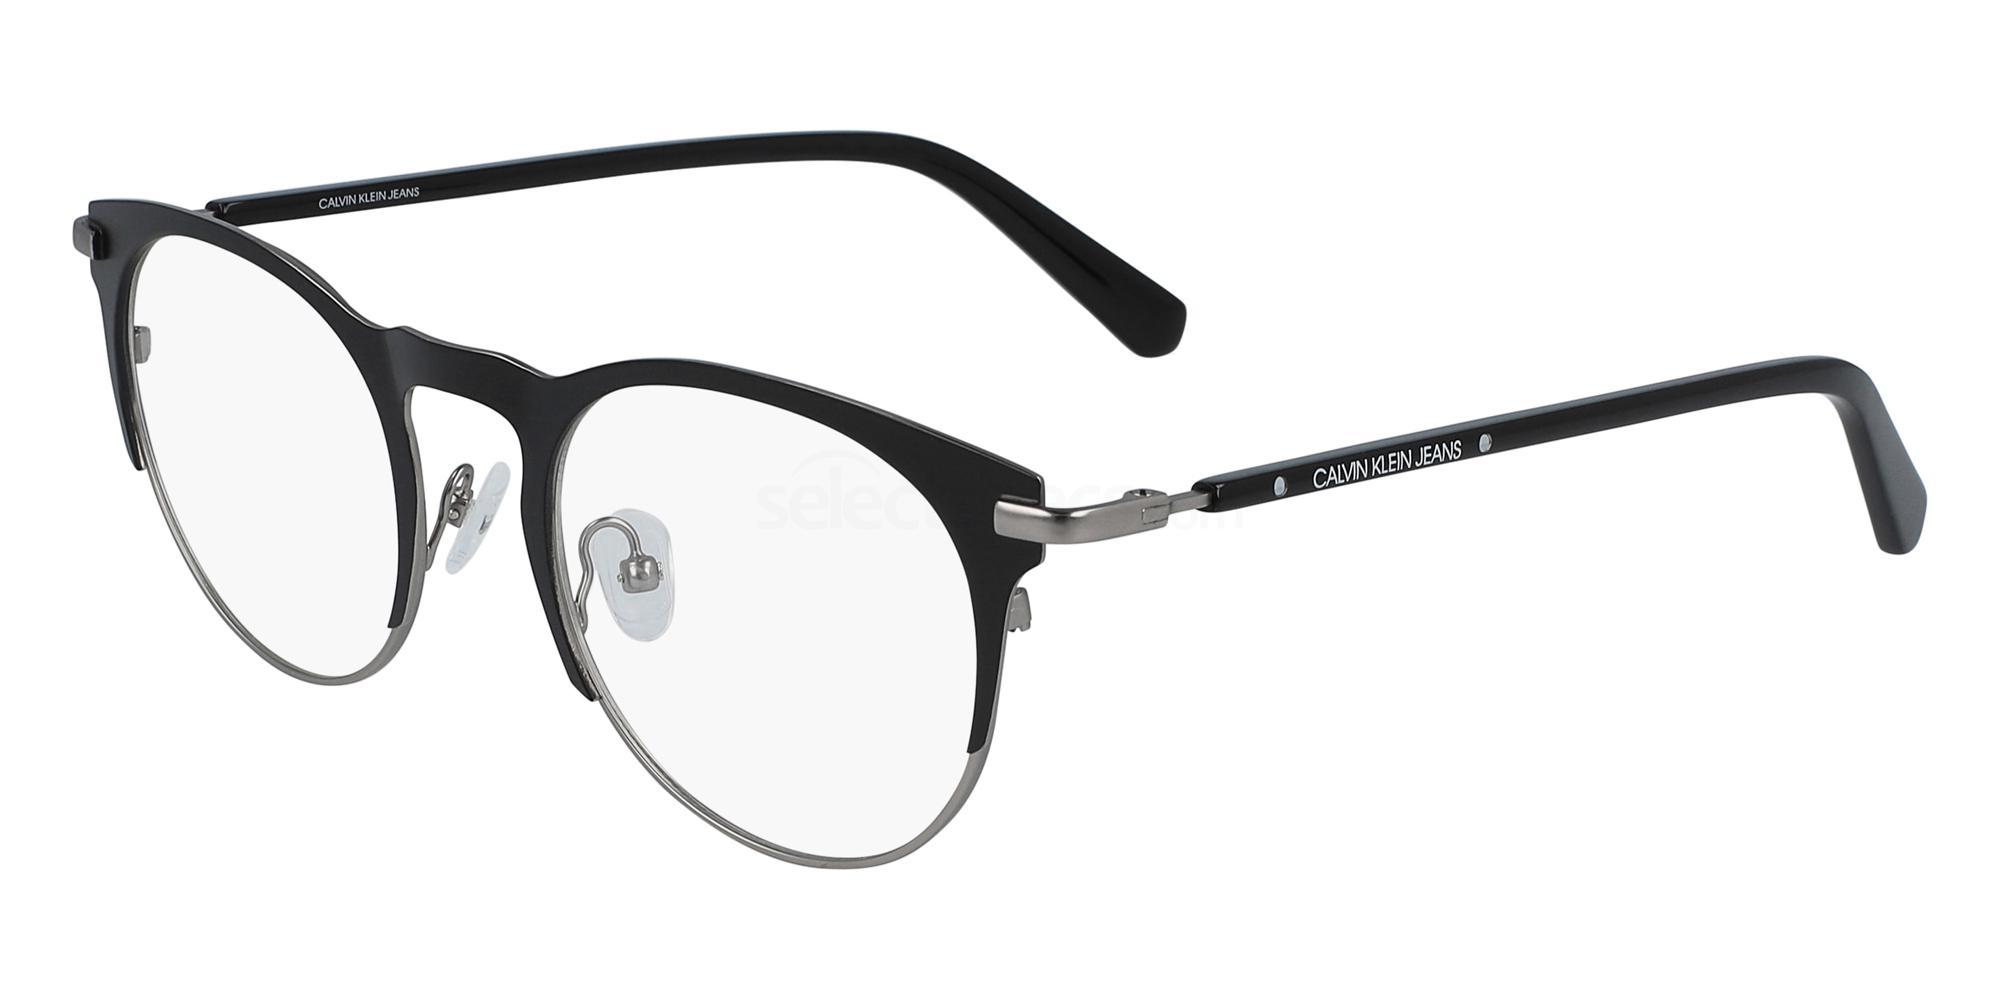 001 CKJ19313 Glasses, Calvin Klein Jeans